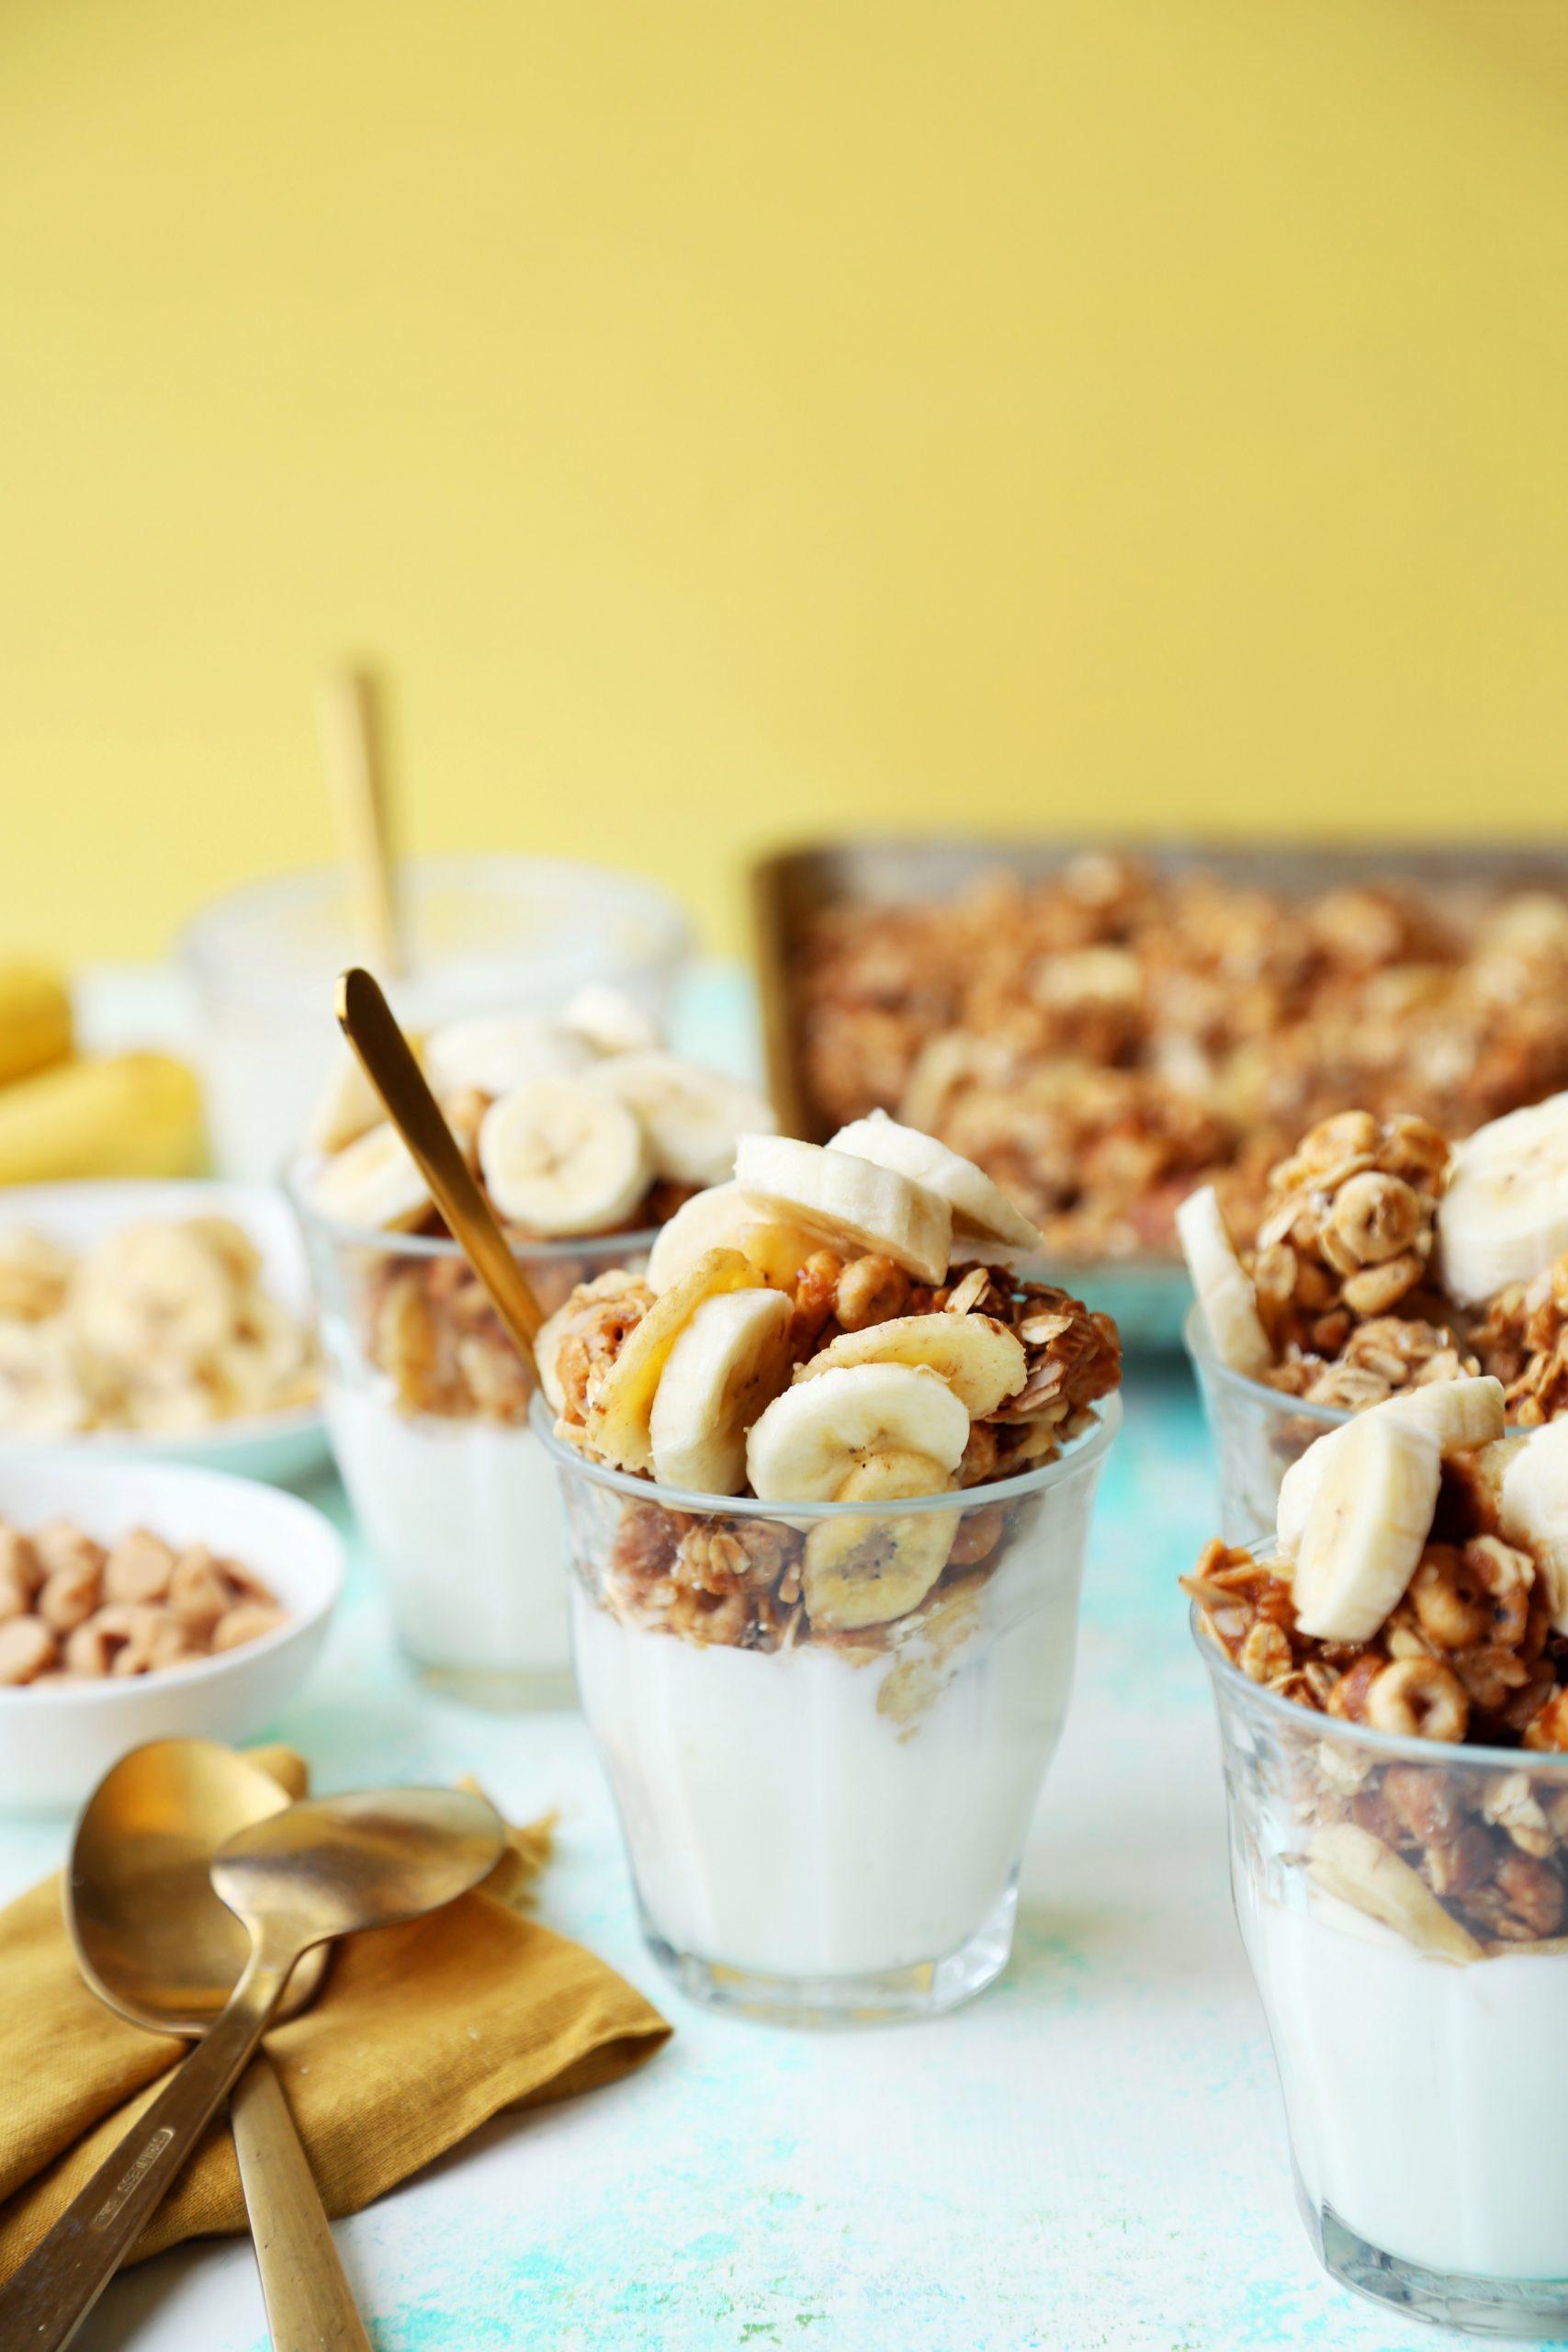 Peanut Butter and Banana Parfaits